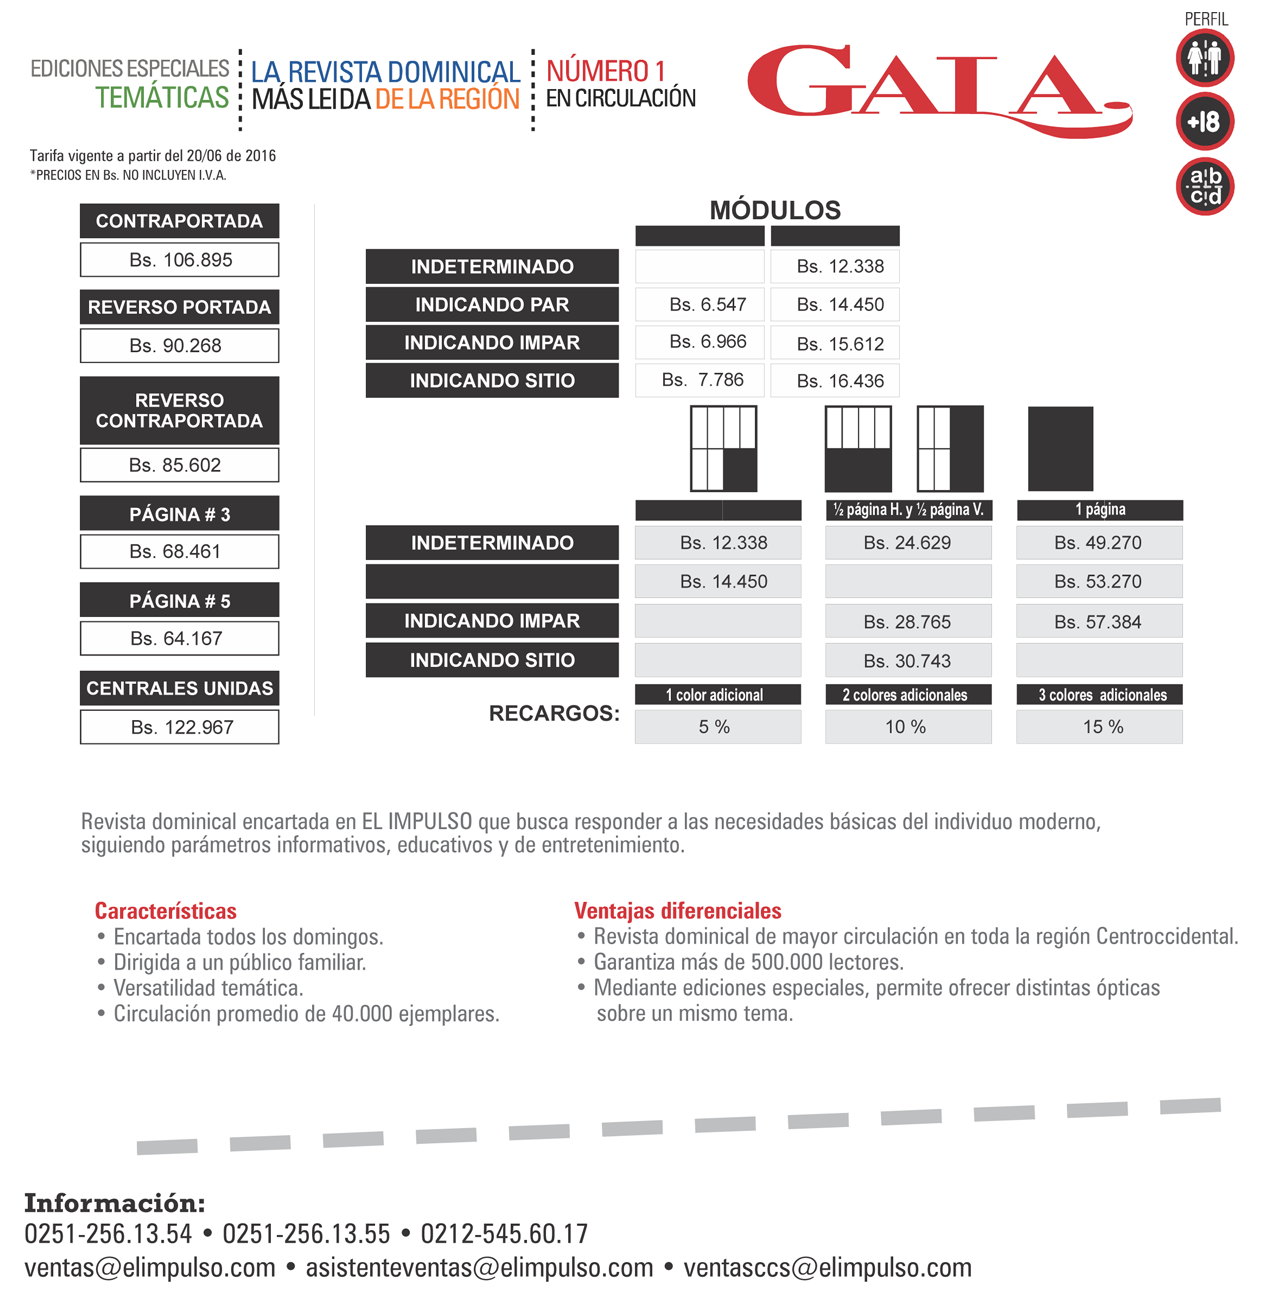 gala_junio_16